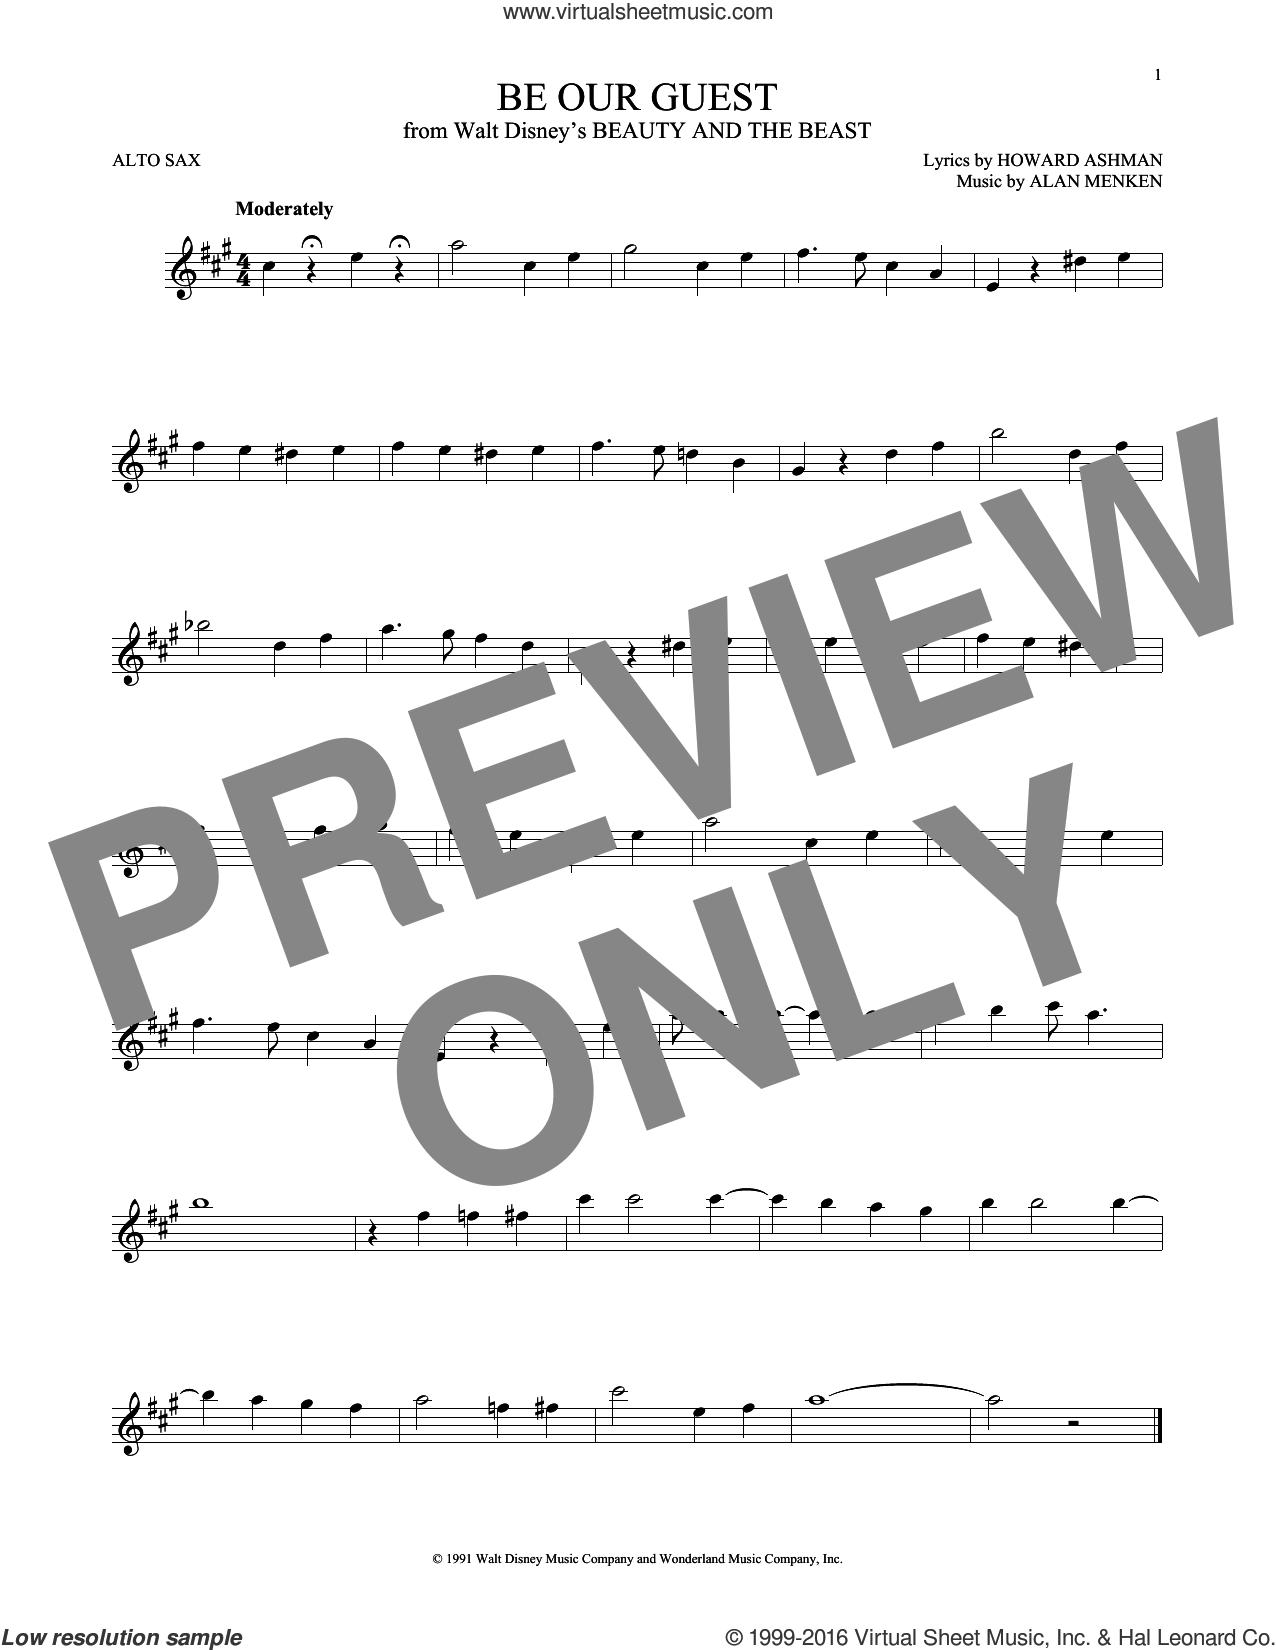 Be Our Guest sheet music for alto saxophone solo by Alan Menken, Alan Menken & Howard Ashman and Howard Ashman, intermediate skill level